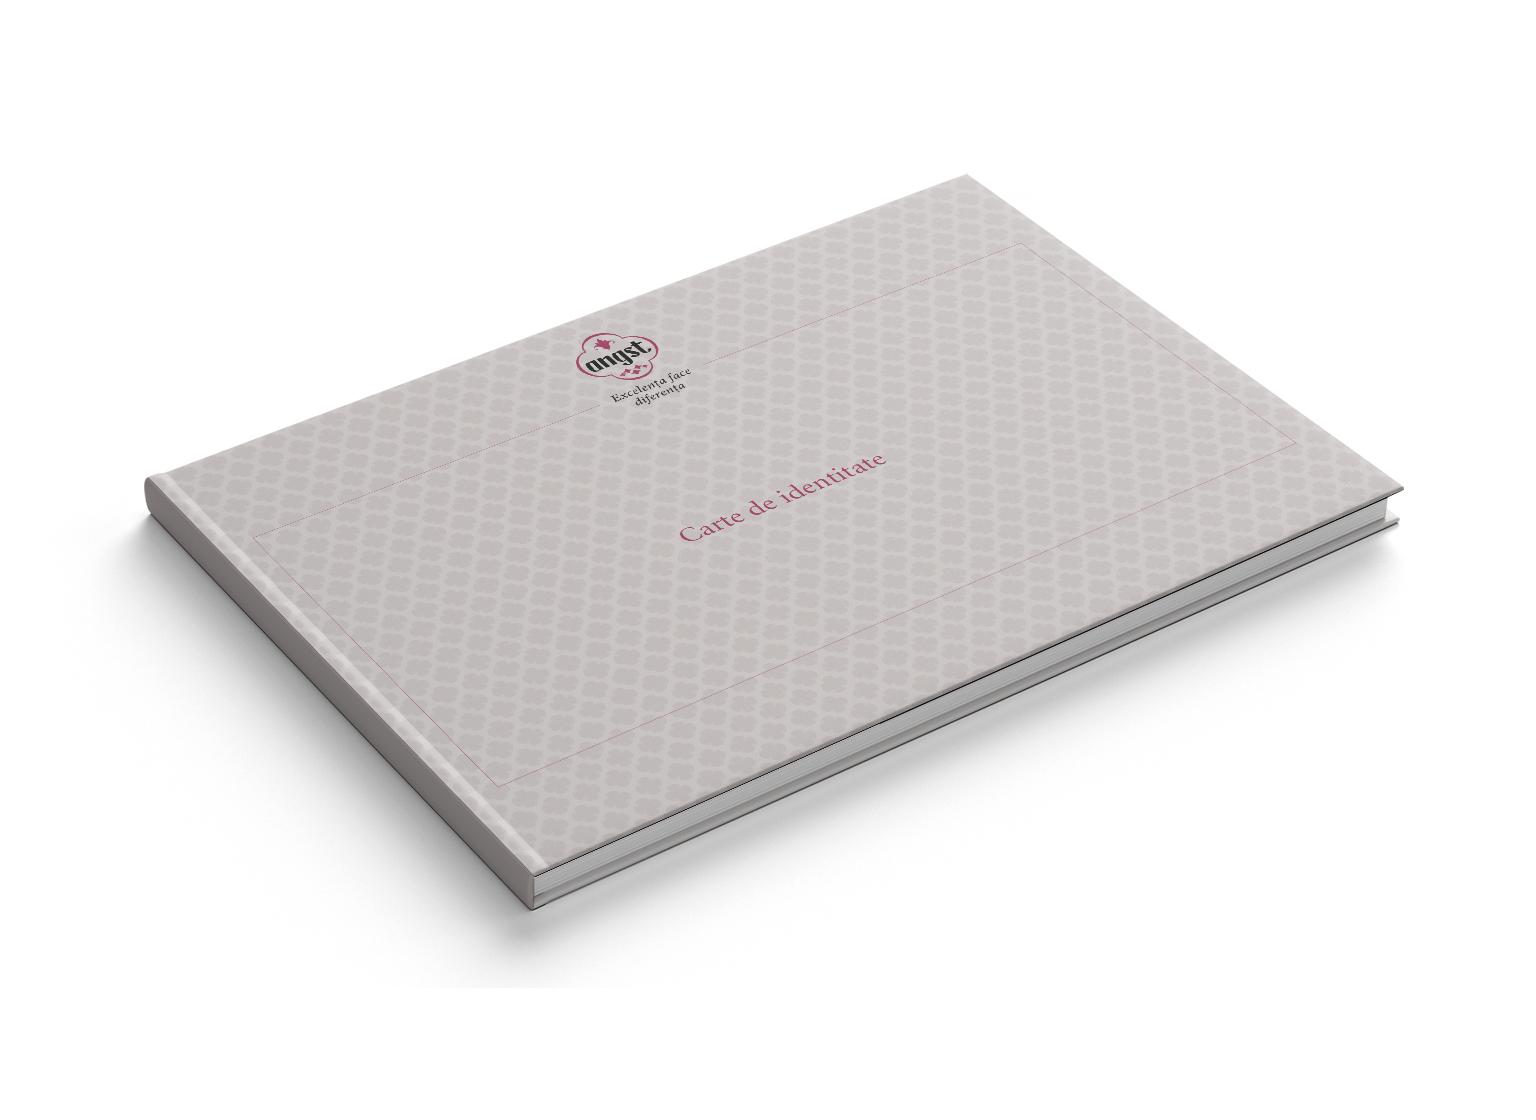 Angst portofoliu inoveo Brand Book